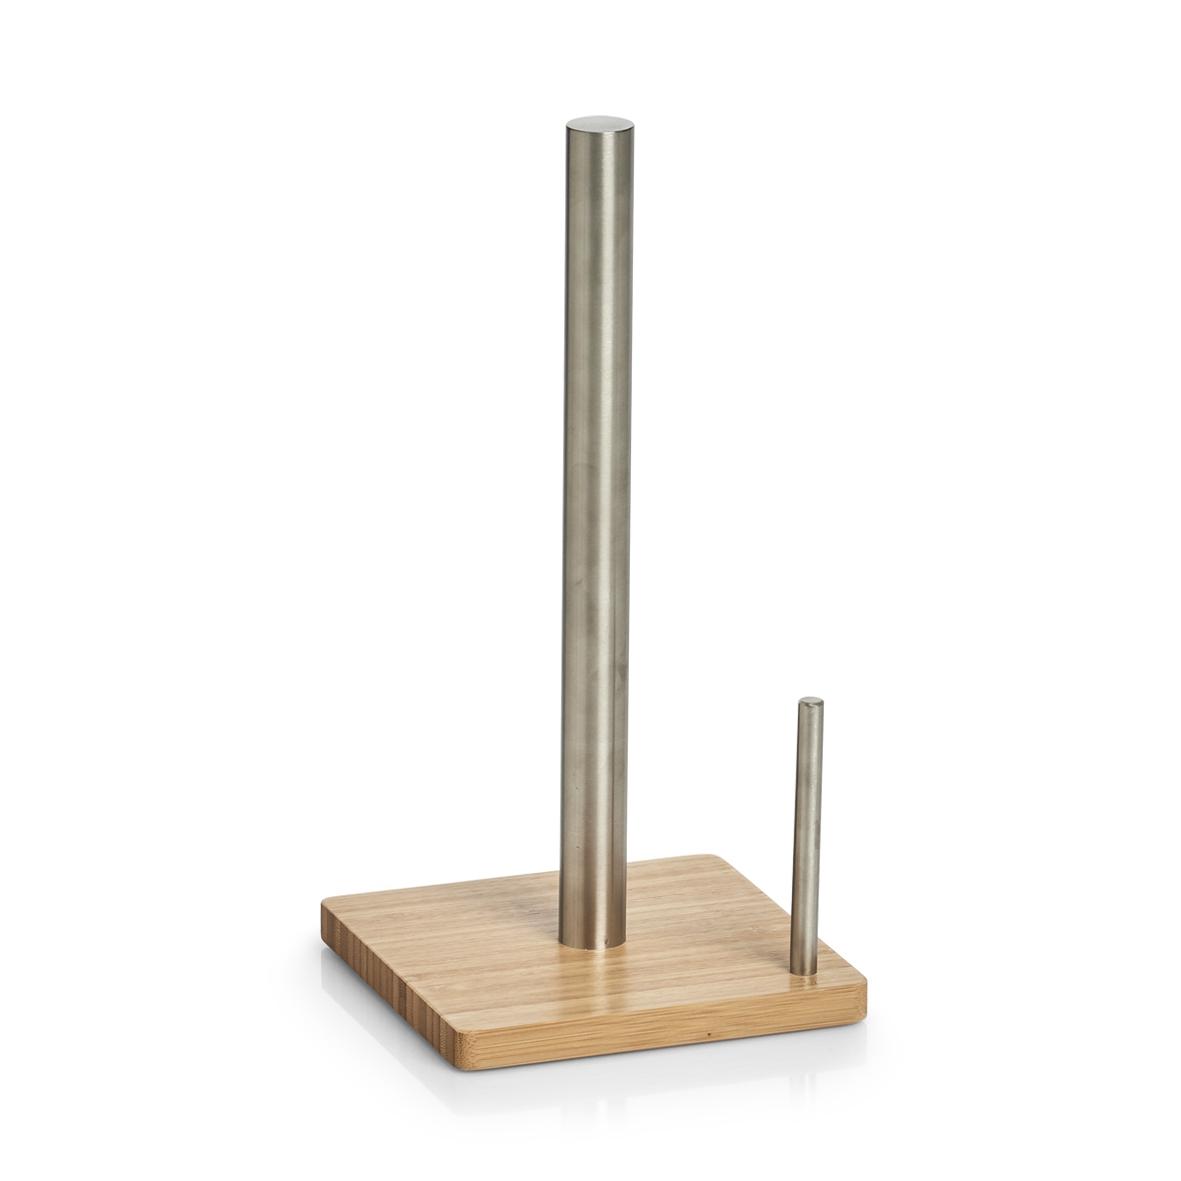 Suport din metal si bambus pentru role de bucatarie, Bamboo Natural, L16xl16xH32,5 cm poza